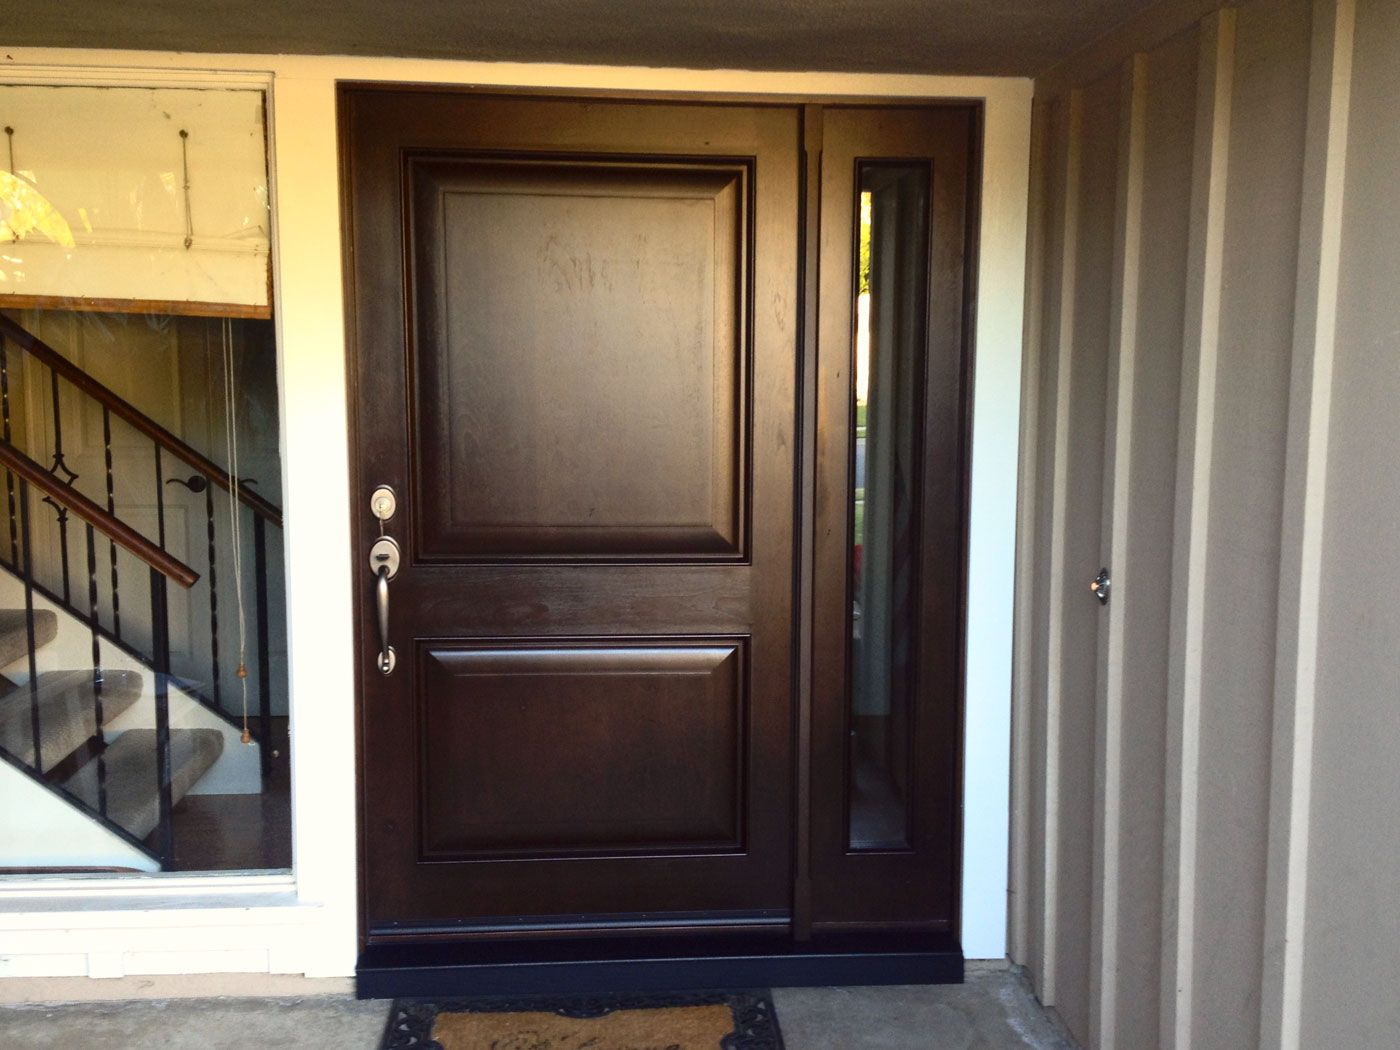 42 Entry Door 42 Entry Doors Pinterest Front Entry And Doors